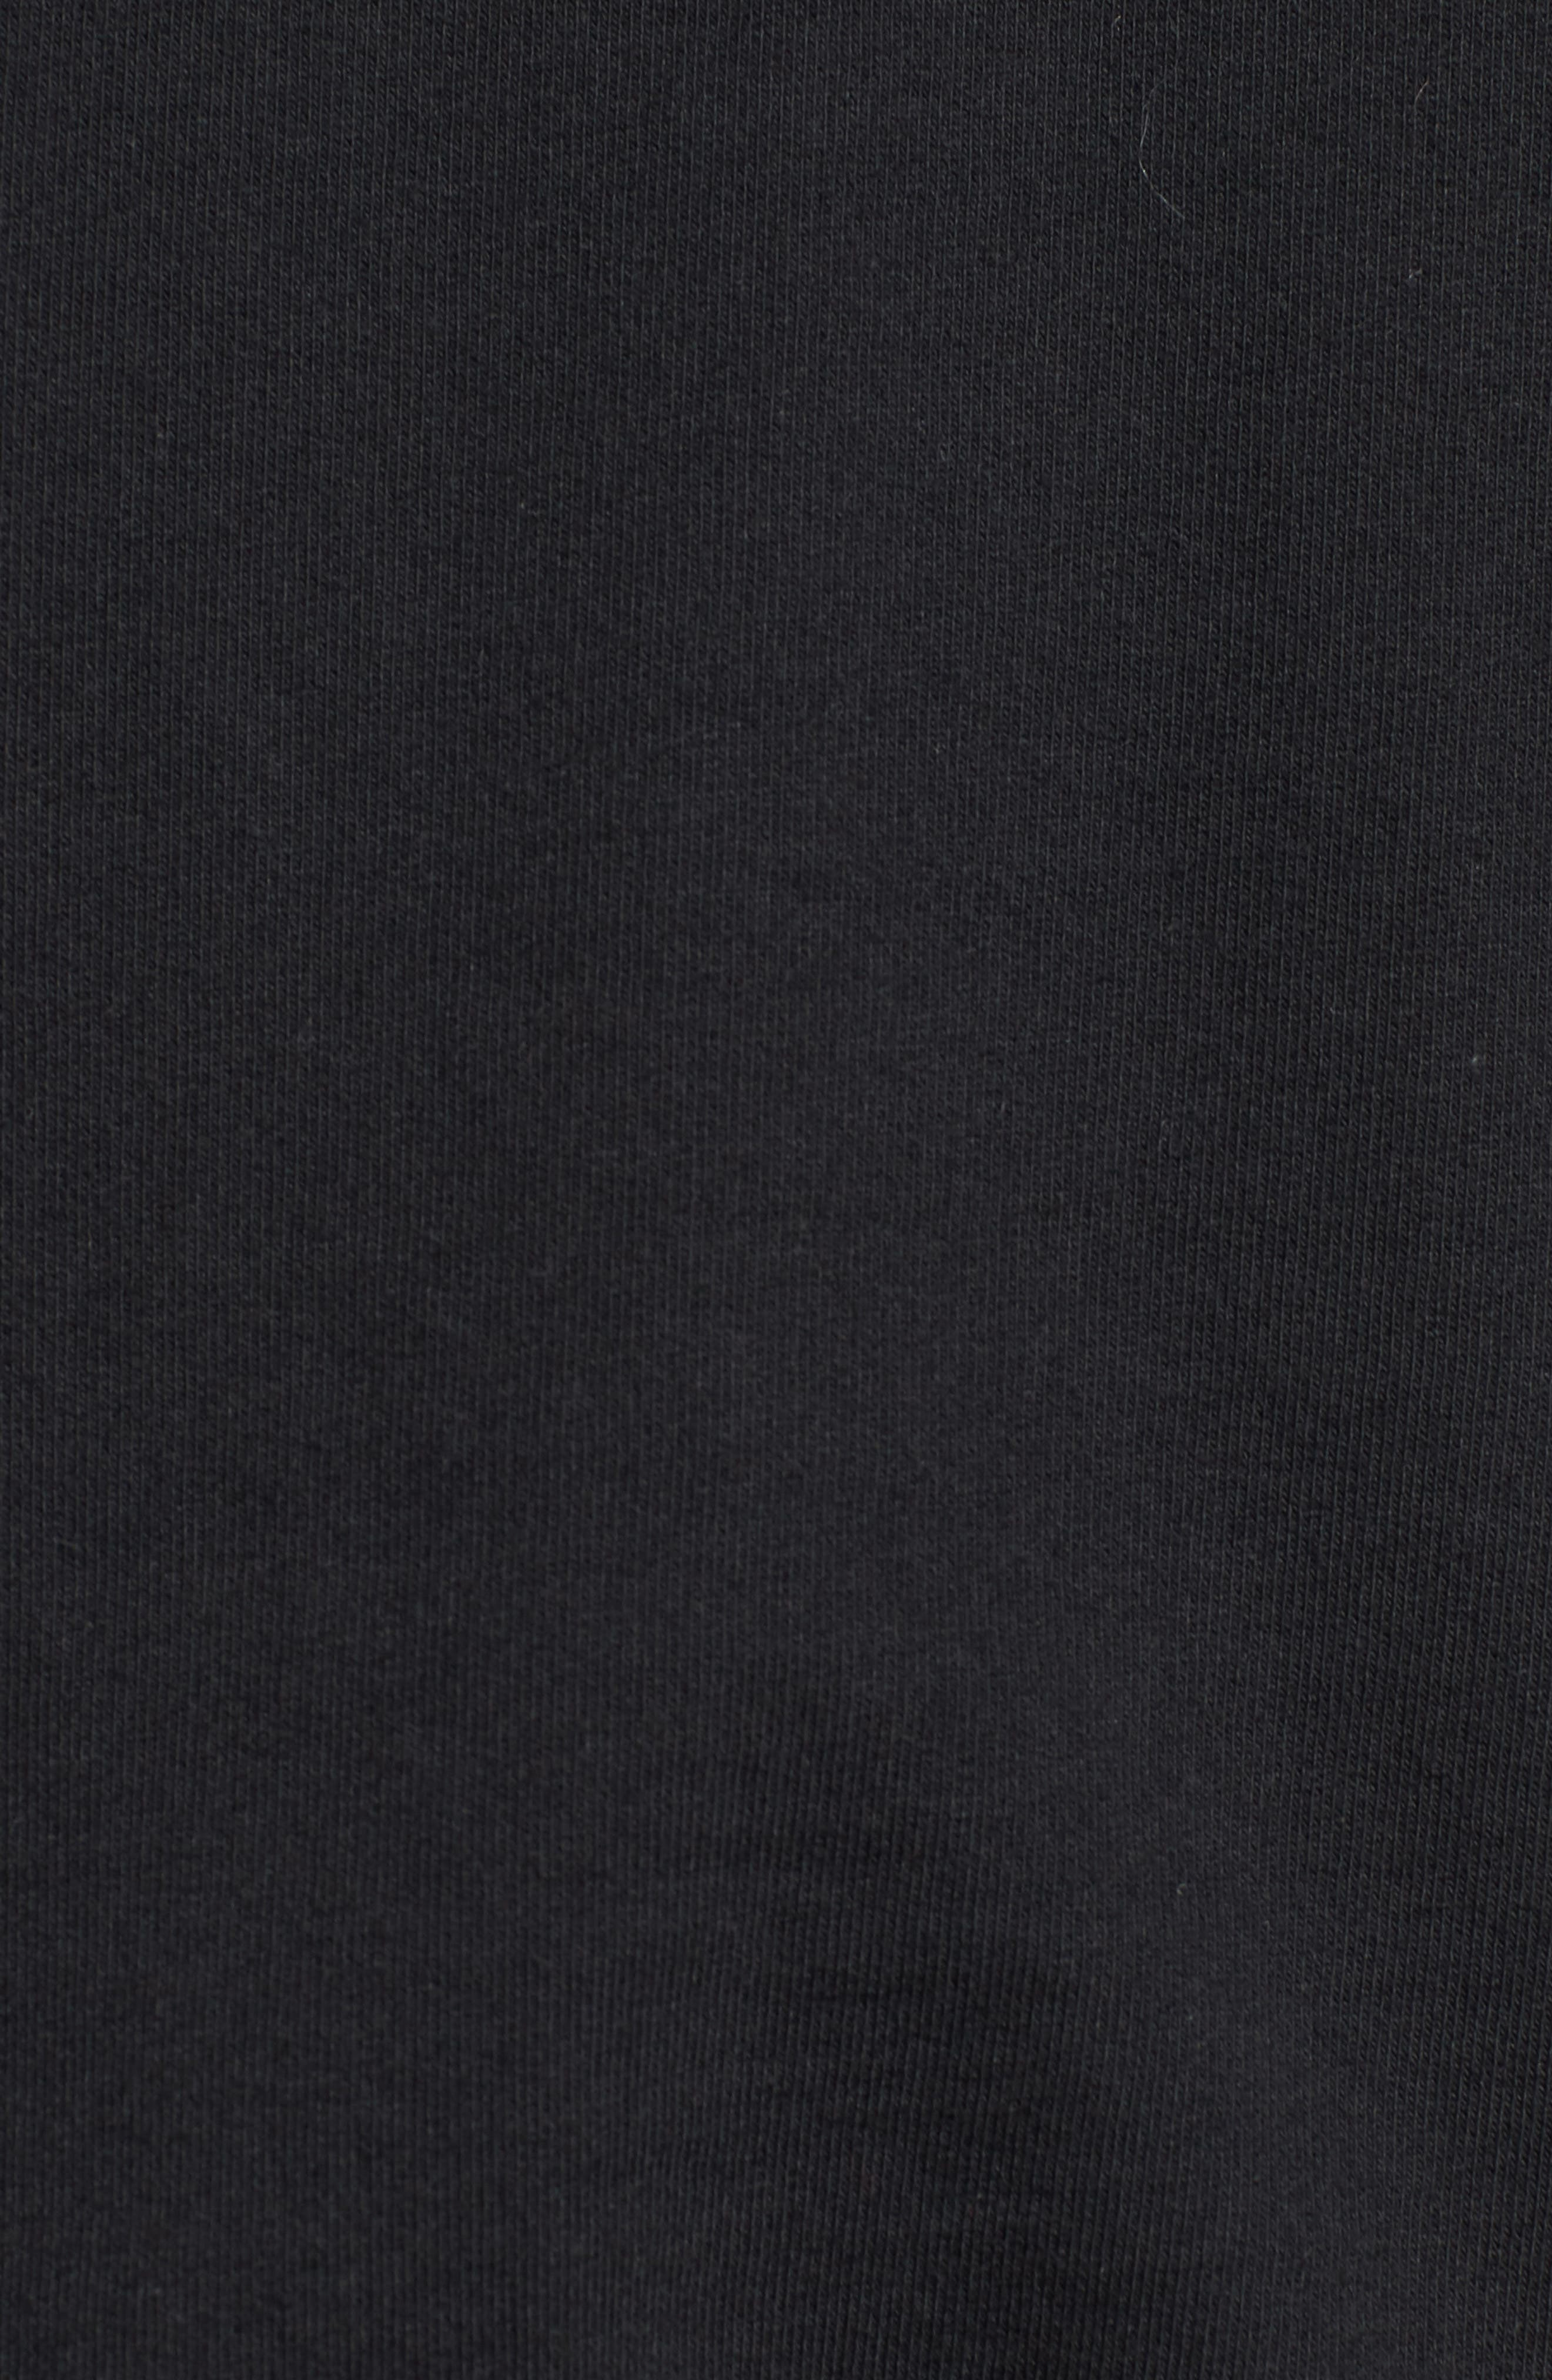 Bamm Bamm Crop Sweatshirt,                             Alternate thumbnail 17, color,